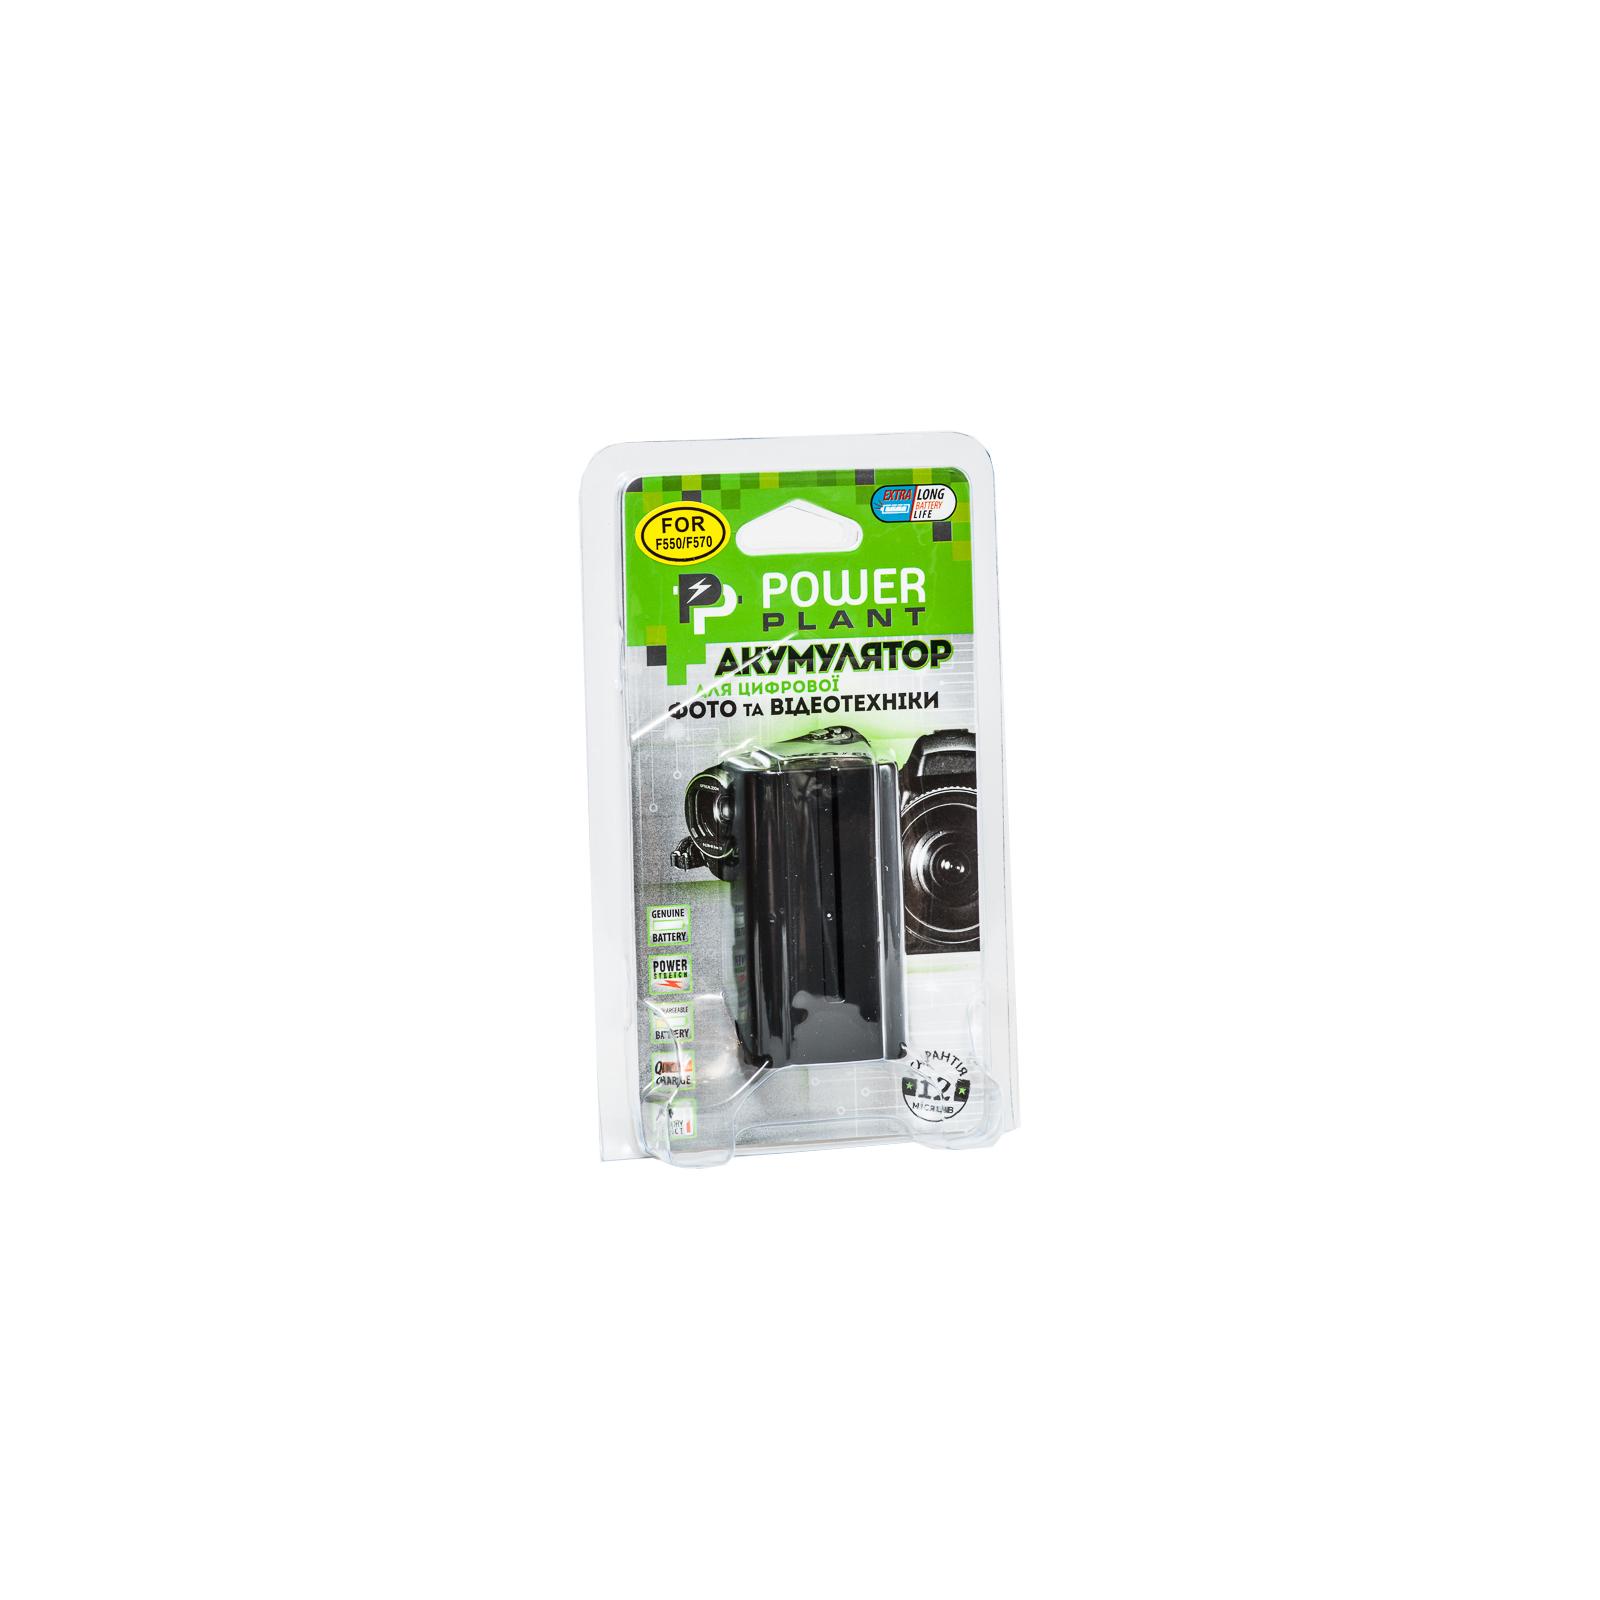 Аккумулятор к фото/видео PowerPlant Sony NP-F550 (DV00DV1031) изображение 3